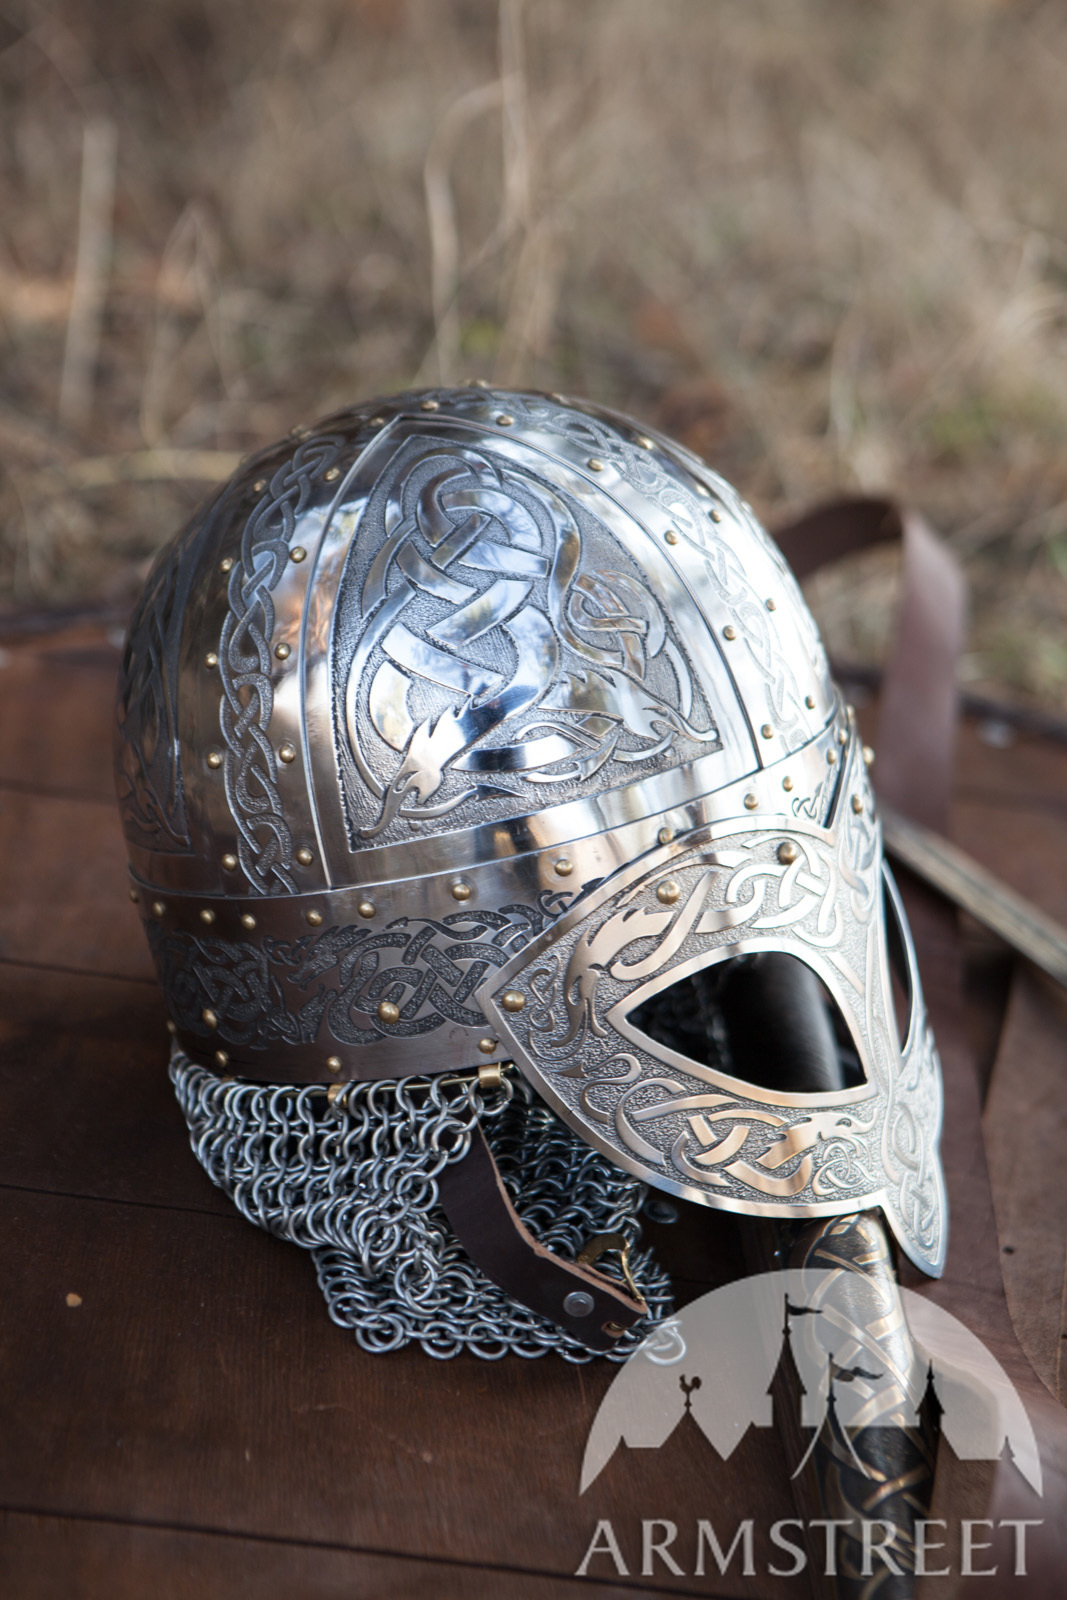 casque valsg rde exclusif de viking en acier inoxydable vendre disponible en acier. Black Bedroom Furniture Sets. Home Design Ideas